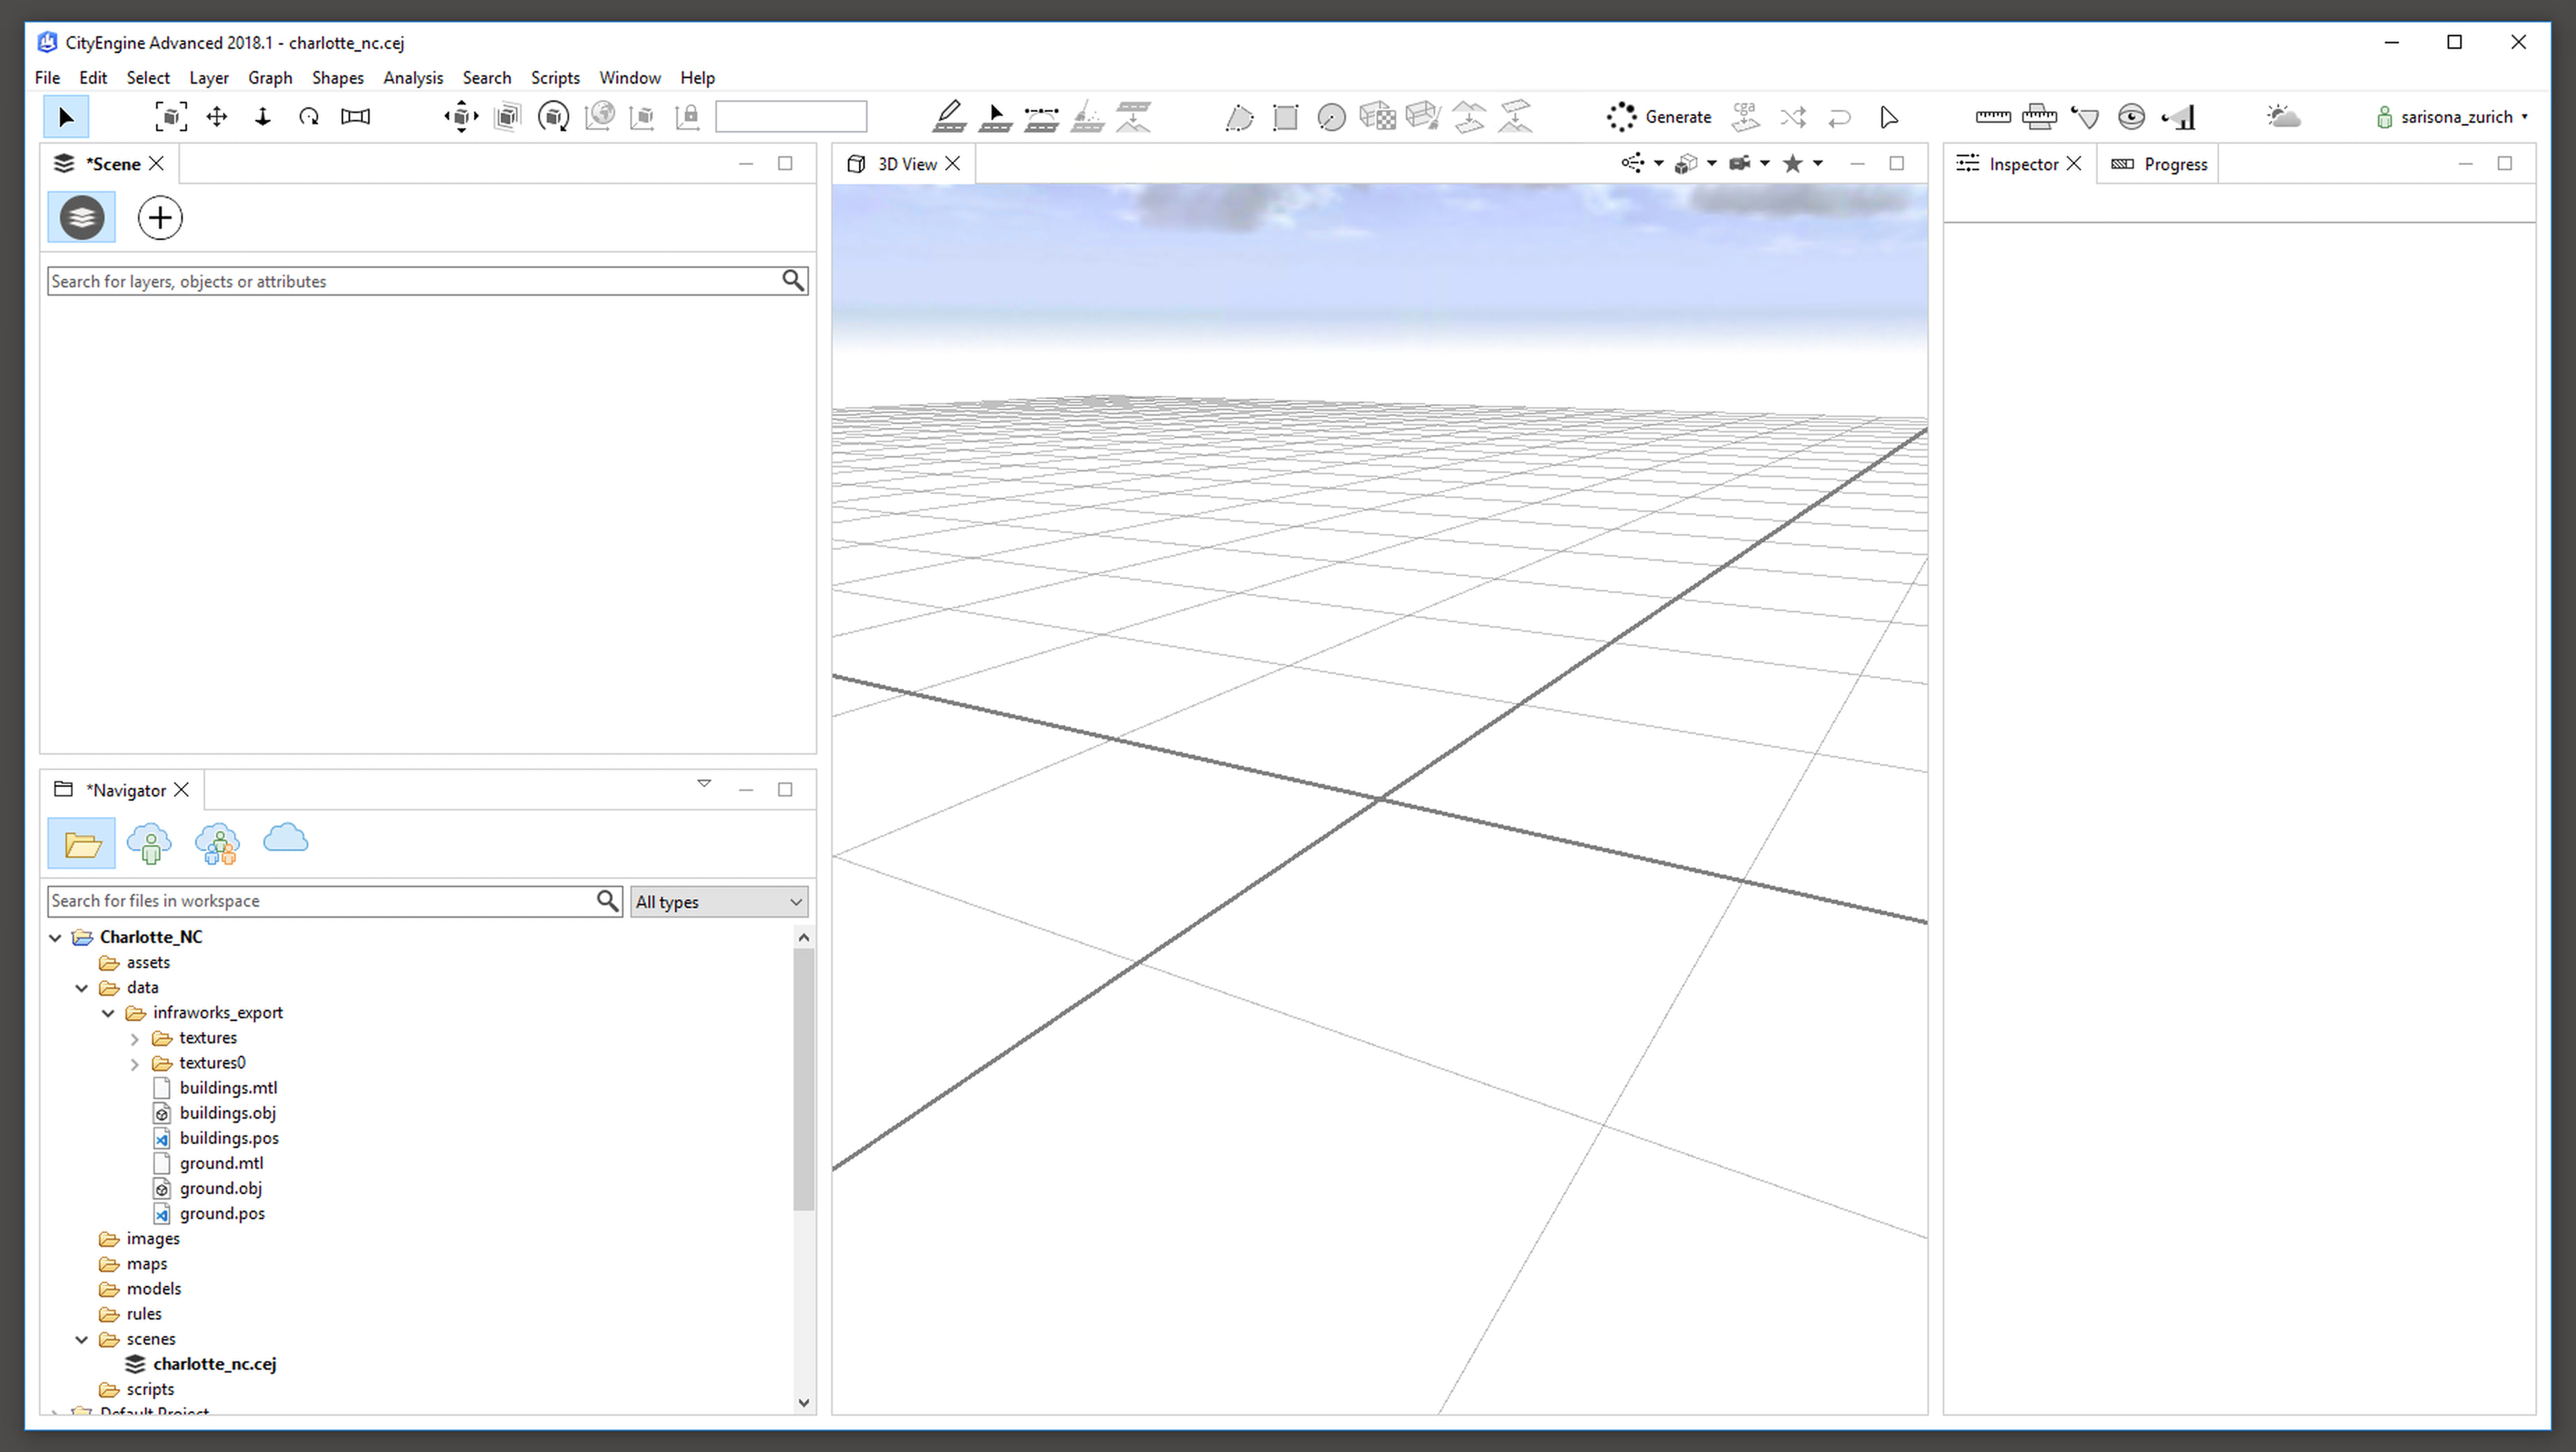 How to exchange data between Esri CityEngine and Autodesk